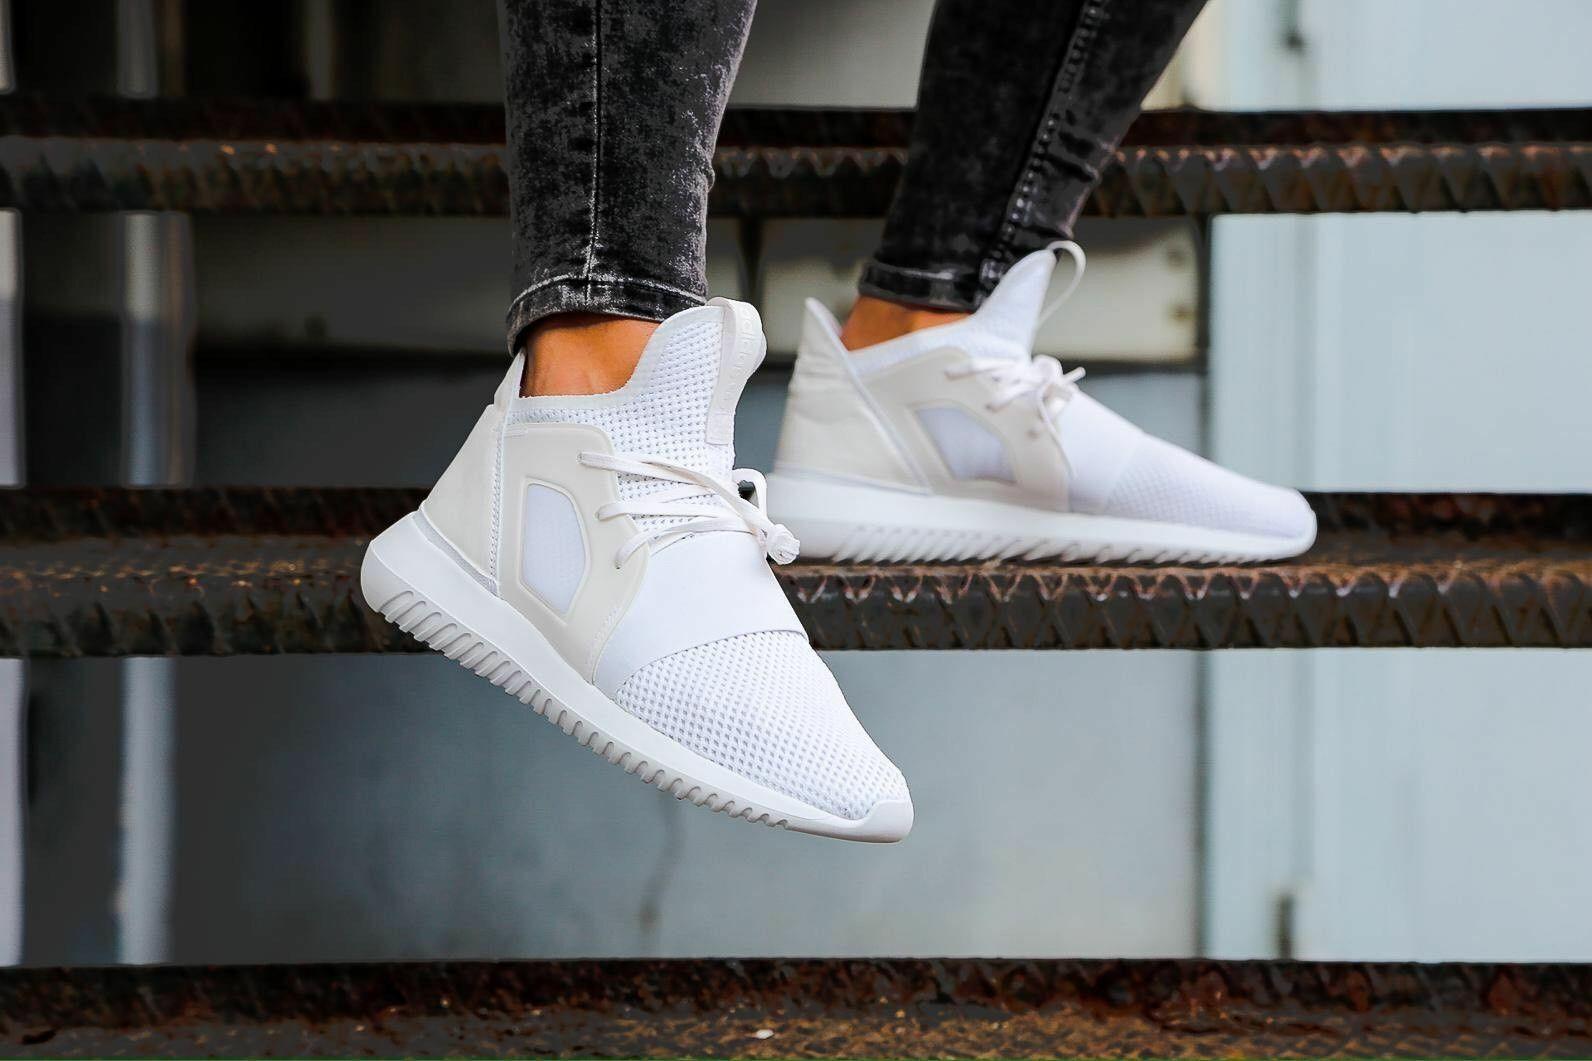 Adidas damen Girls Tubular Defiant Weiß Trainers schuhe BB5116 UK 3.5 to 9